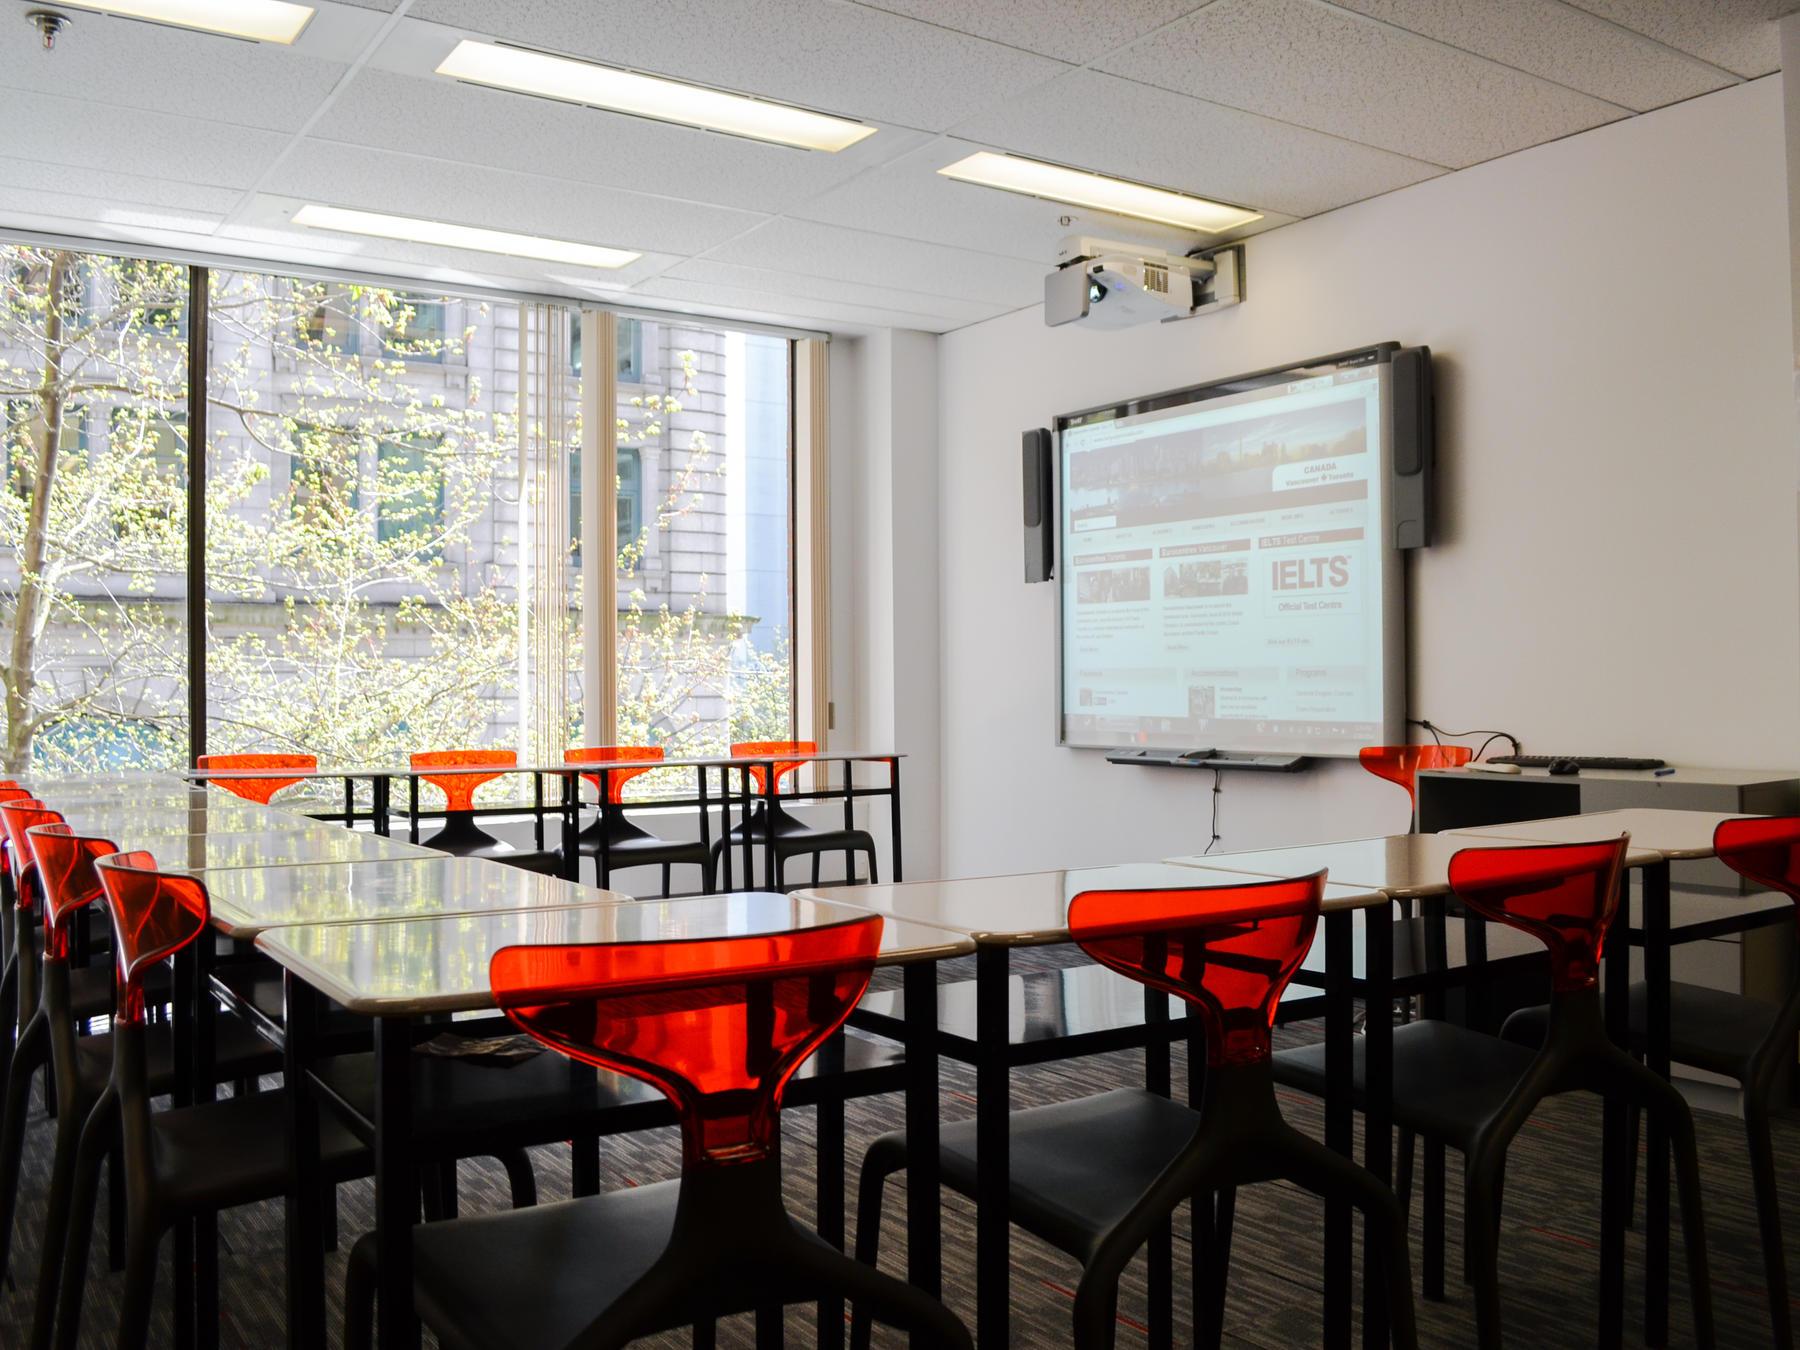 vancouver_school-9